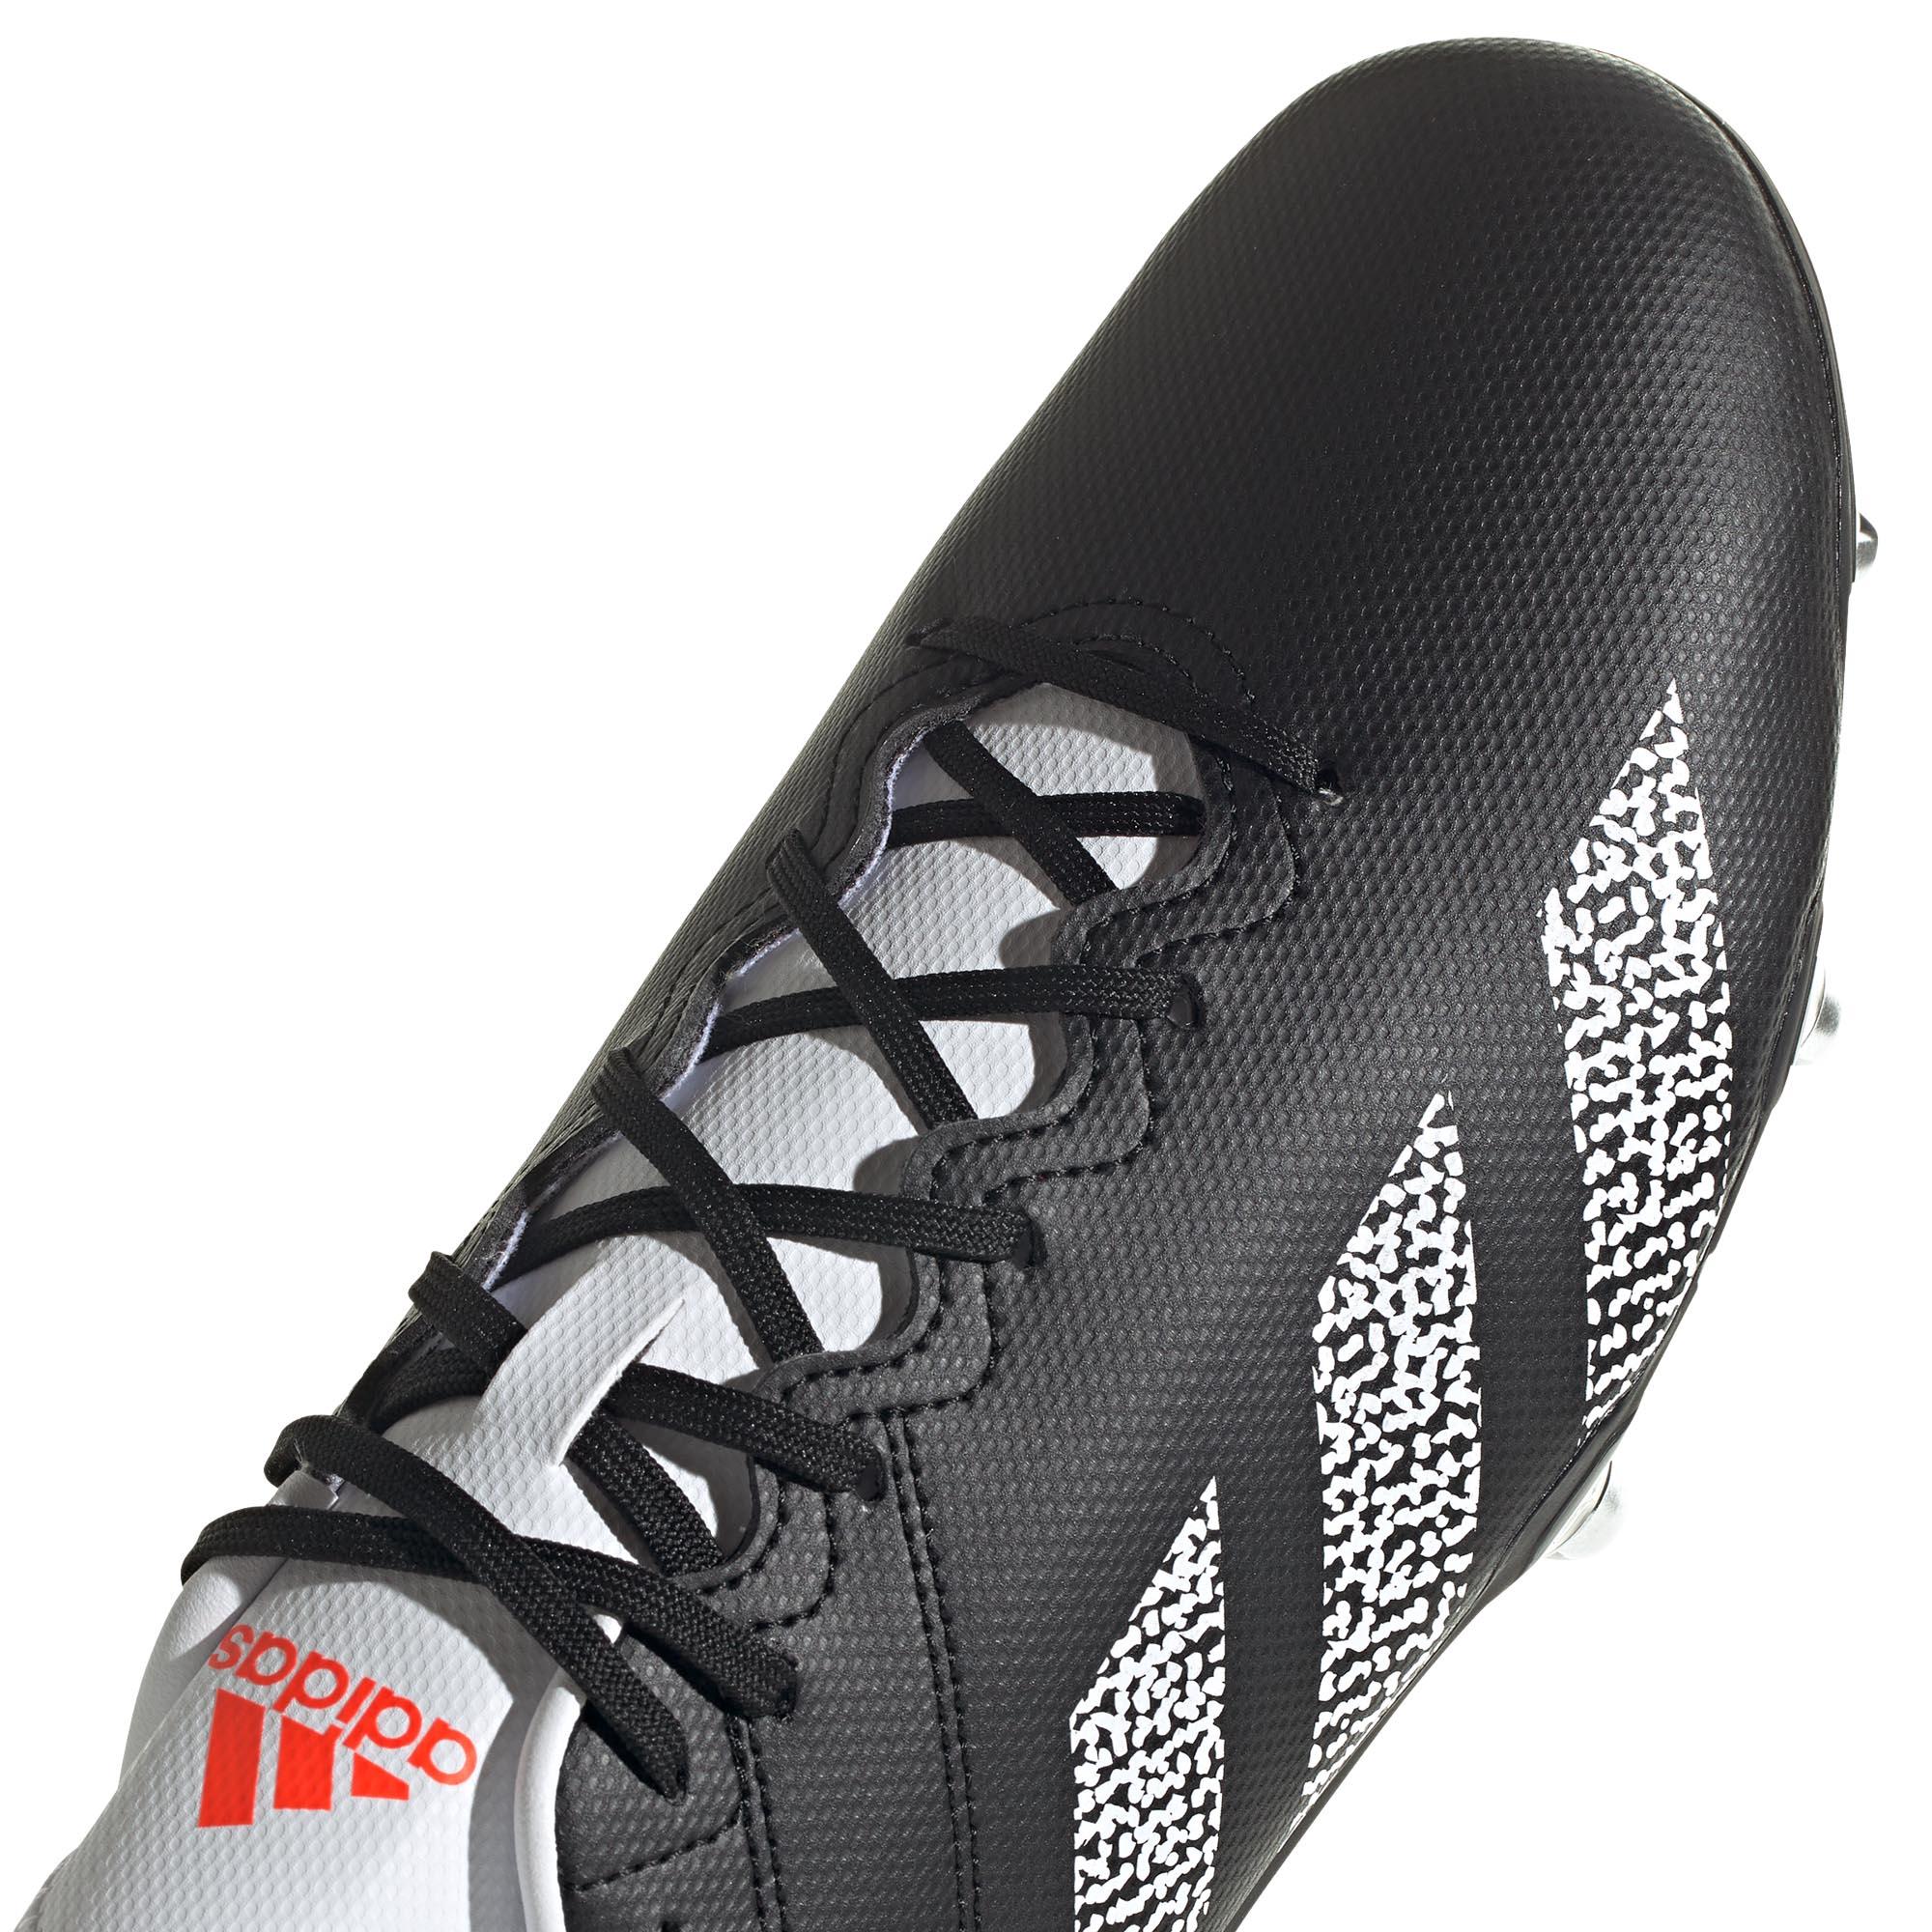 miniature 8 - Adidas Kakari SG Terrain Souple Adulte Unisexe Rugby Union Boot Noir/Blanc